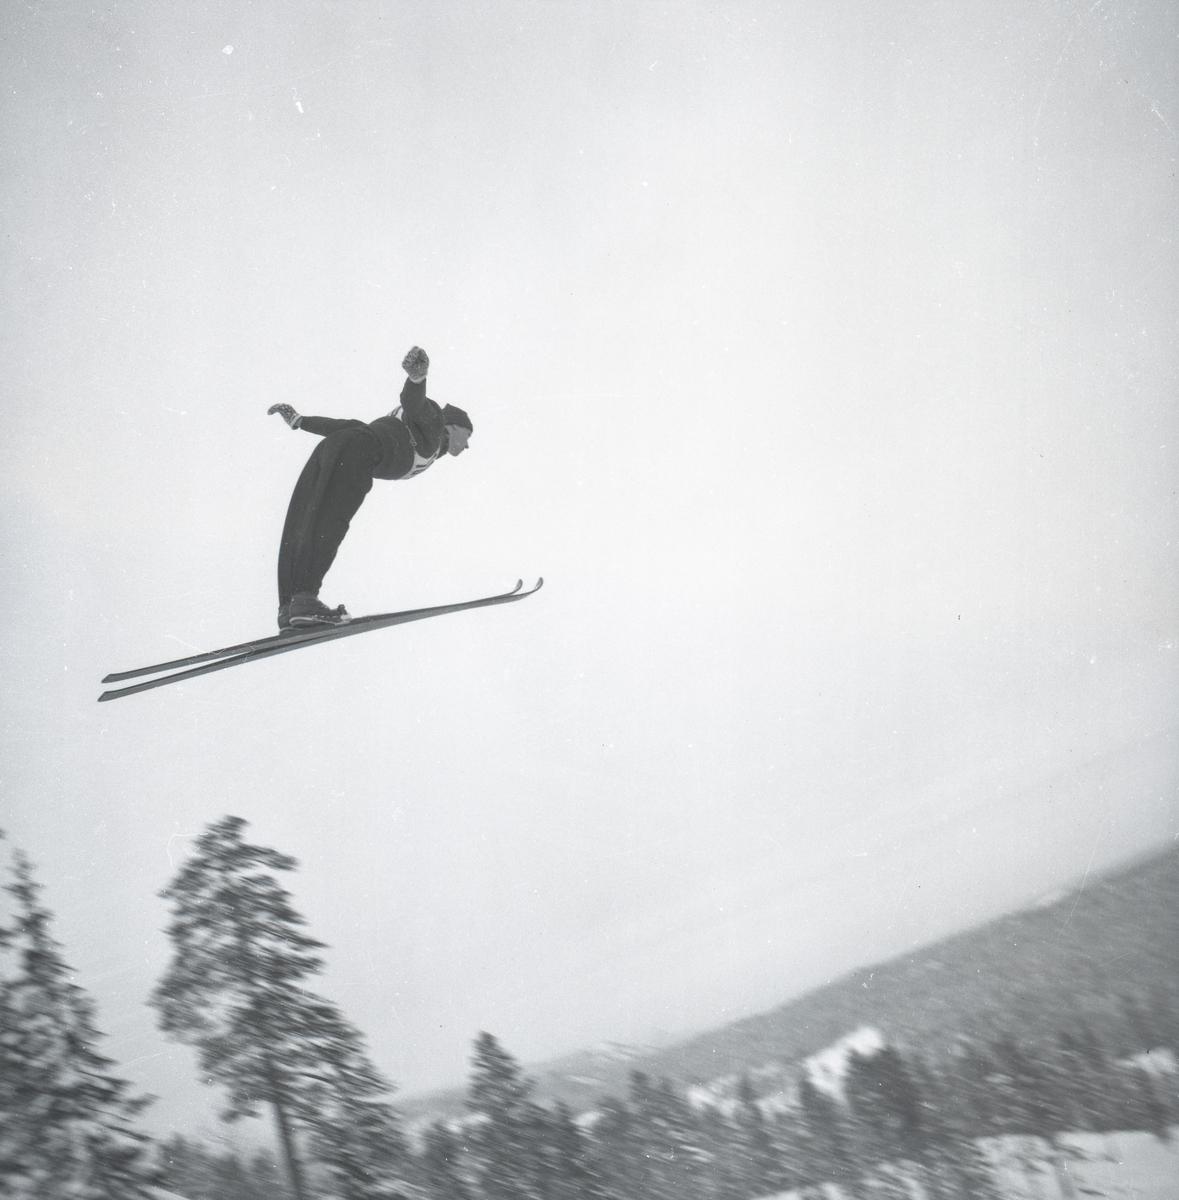 Kongsberg skier in action